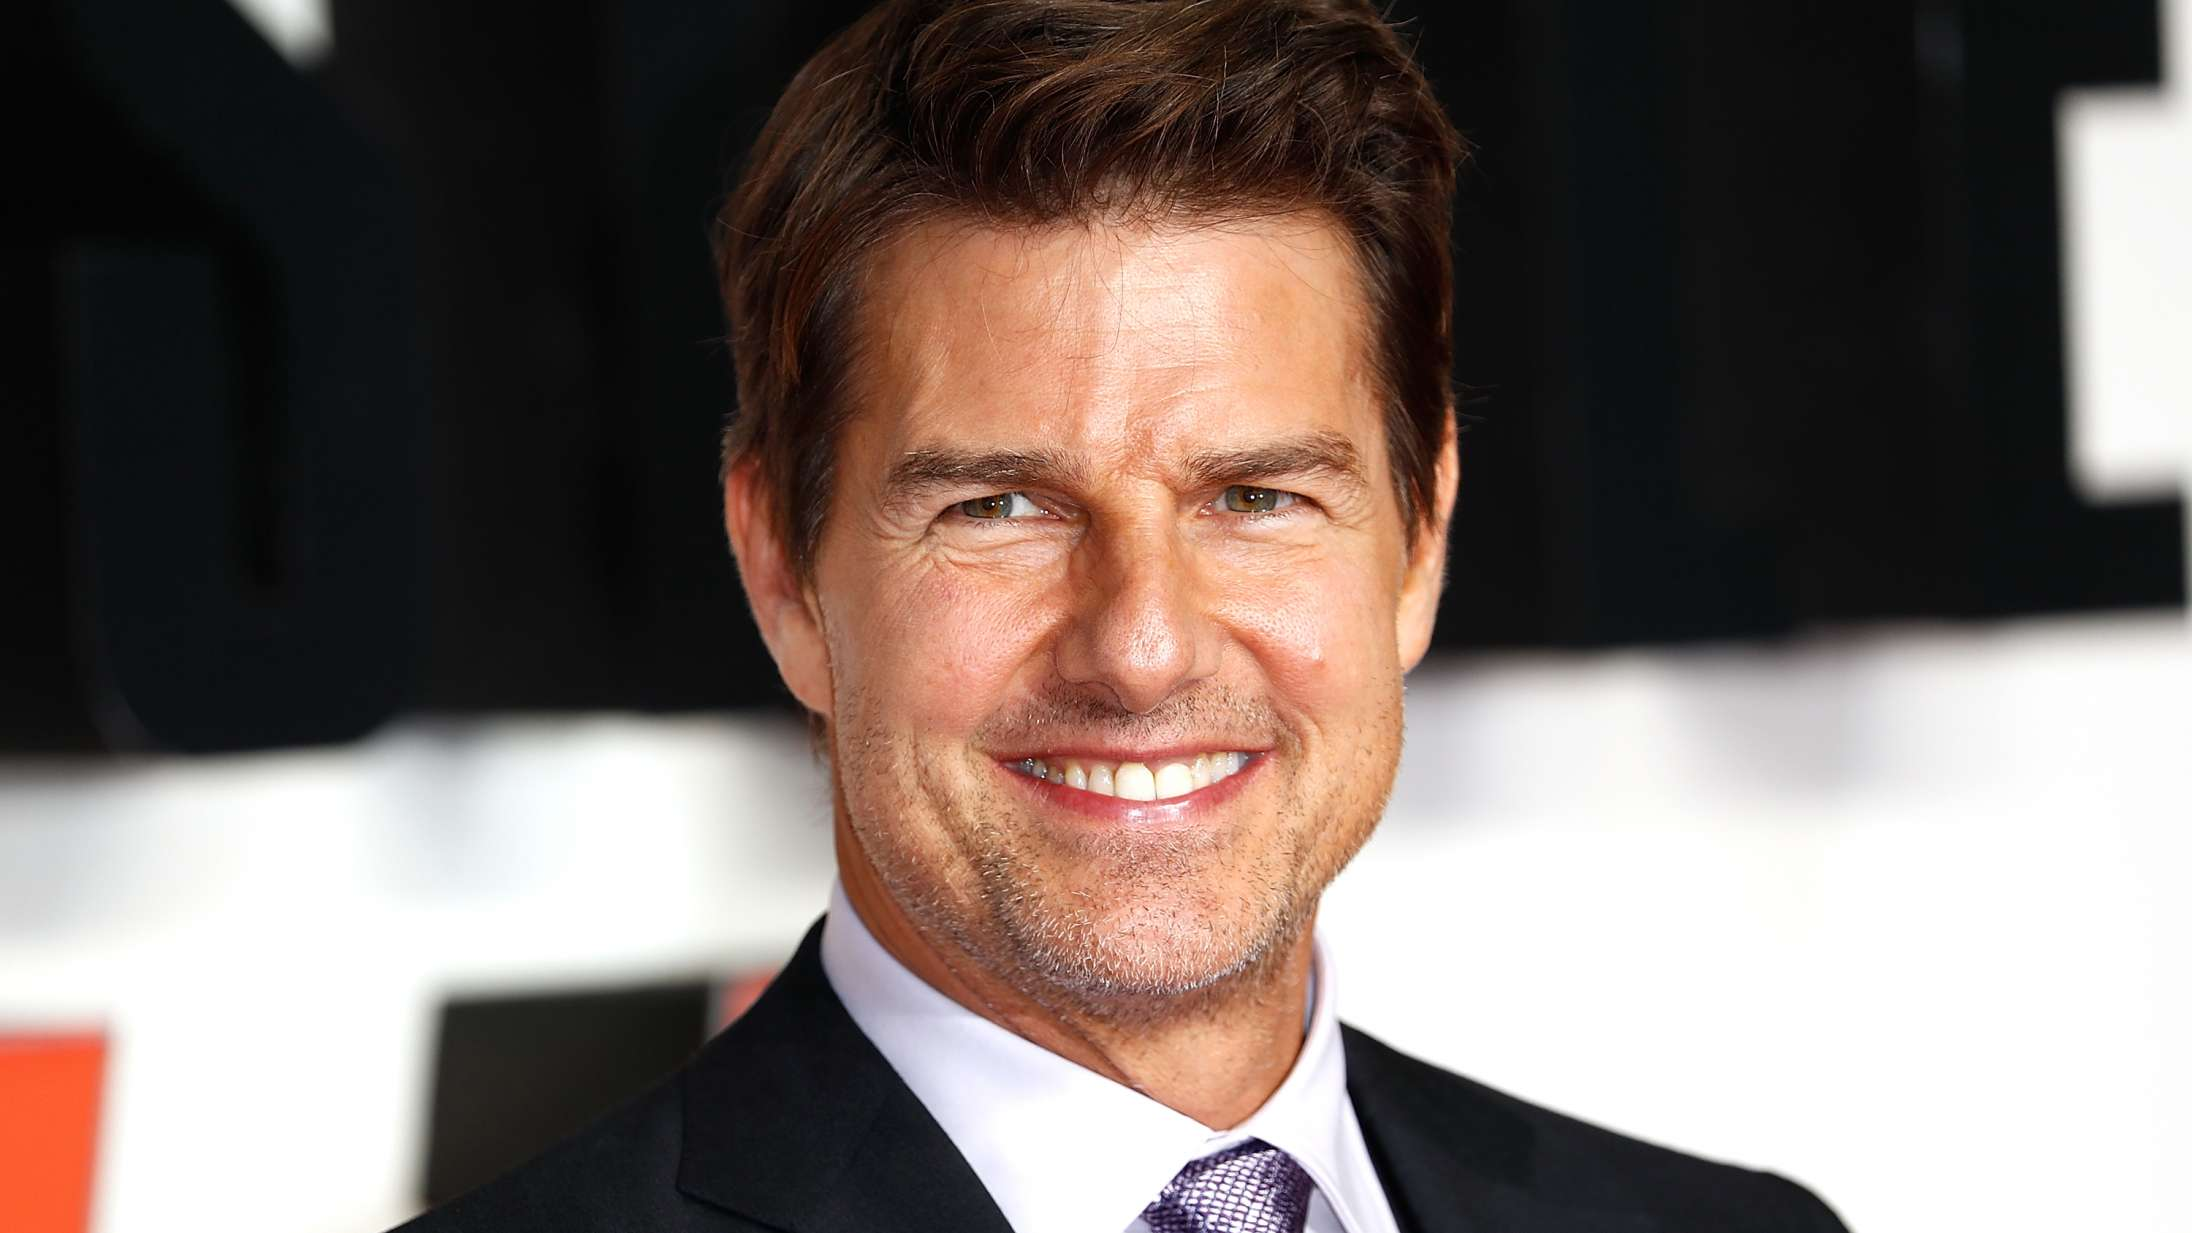 Var Tom Cruises episke covid-vredesudbrud bare et PR-stunt? Det mener Scientology-kritiker Leah Remini